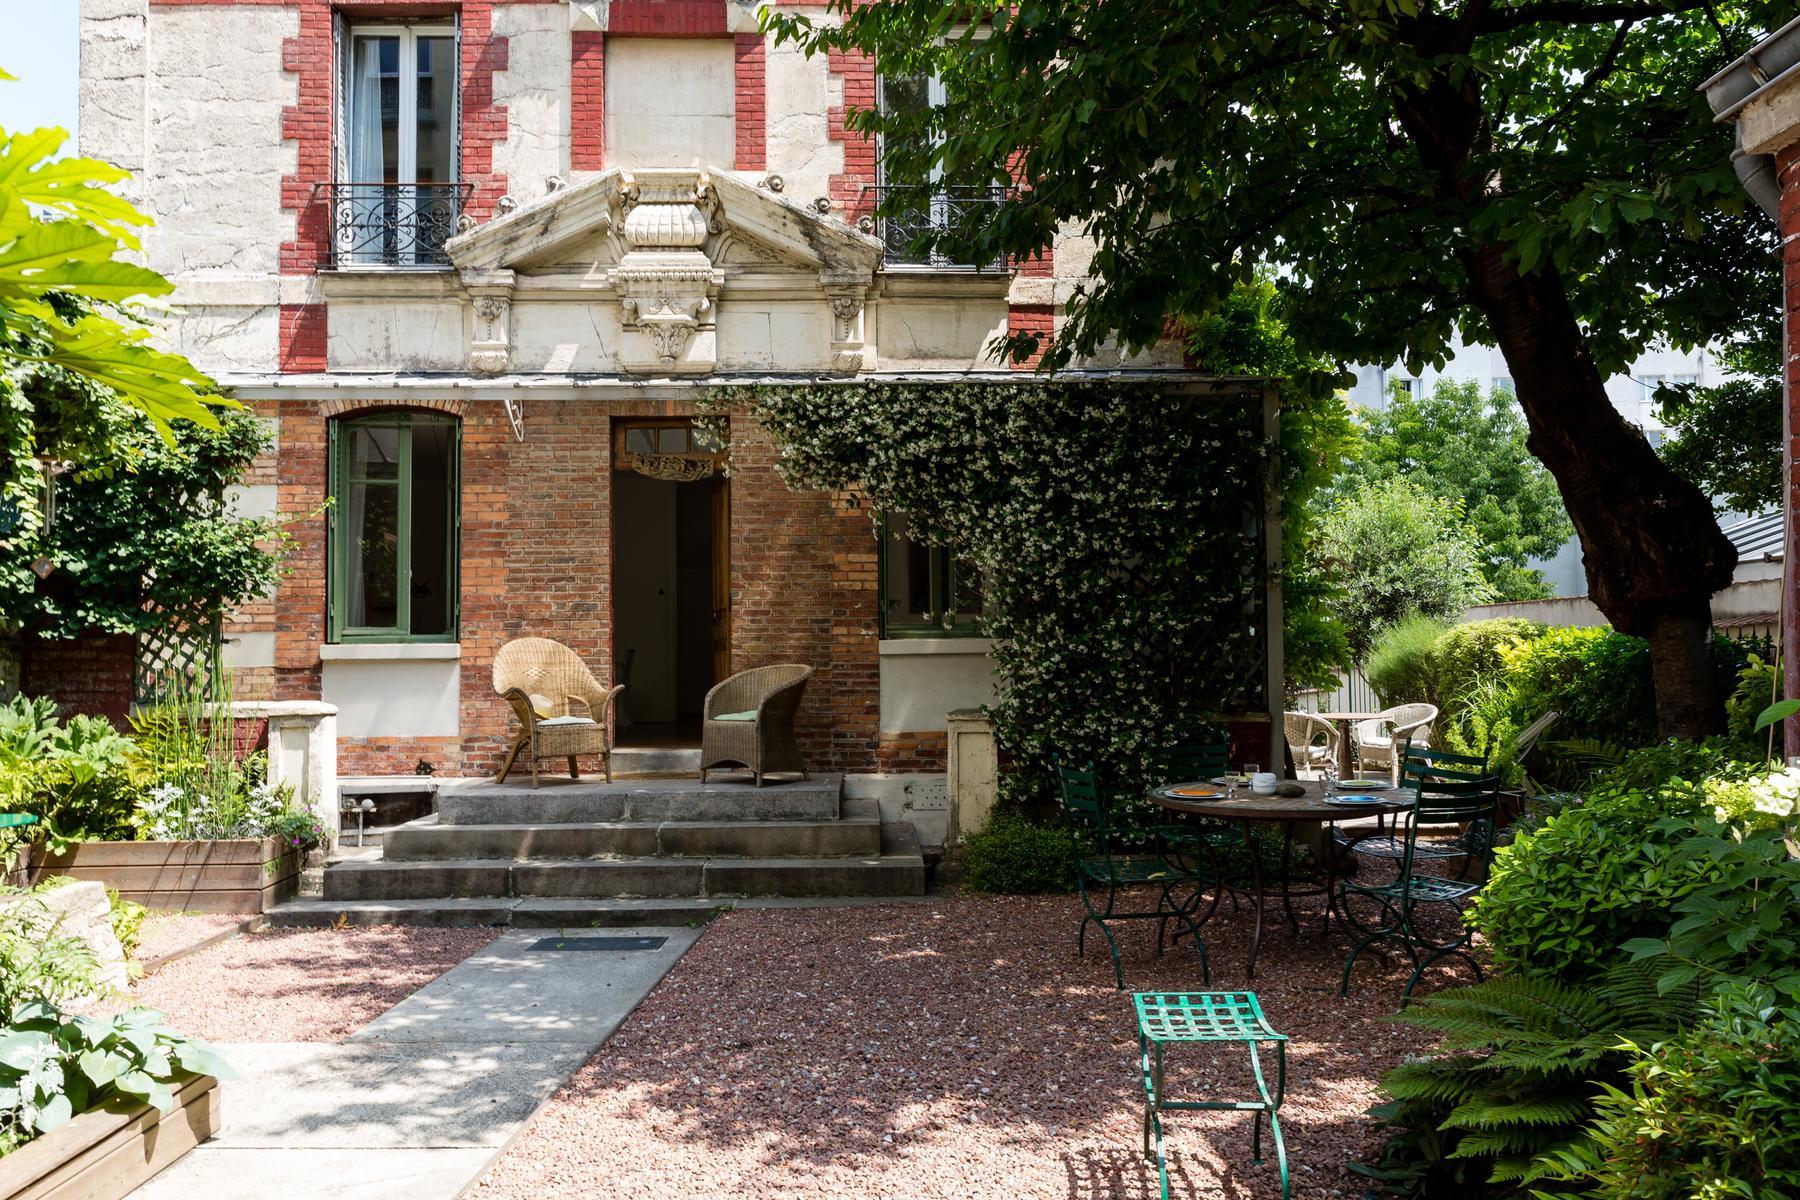 Paris - Rue de Patay Townhouse II